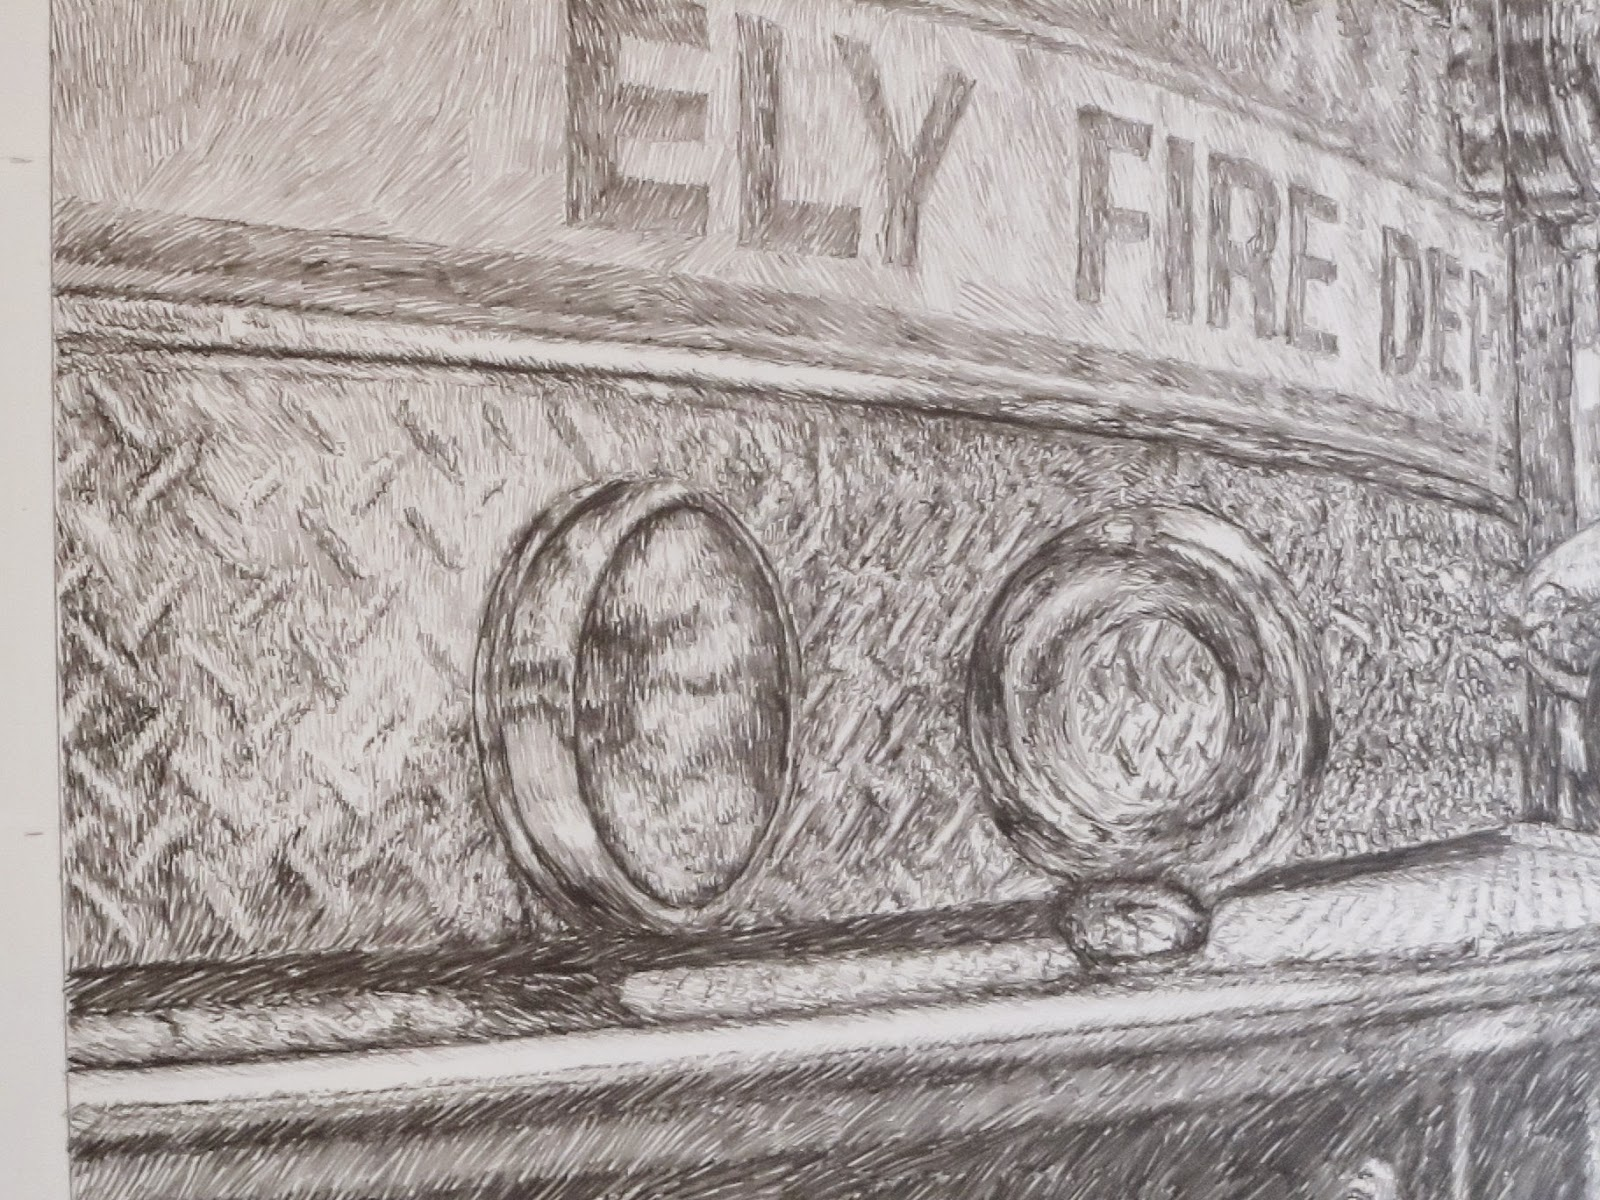 Pencil, drawing, graphite, john, huisman, art, work, detail, minnesota, artist